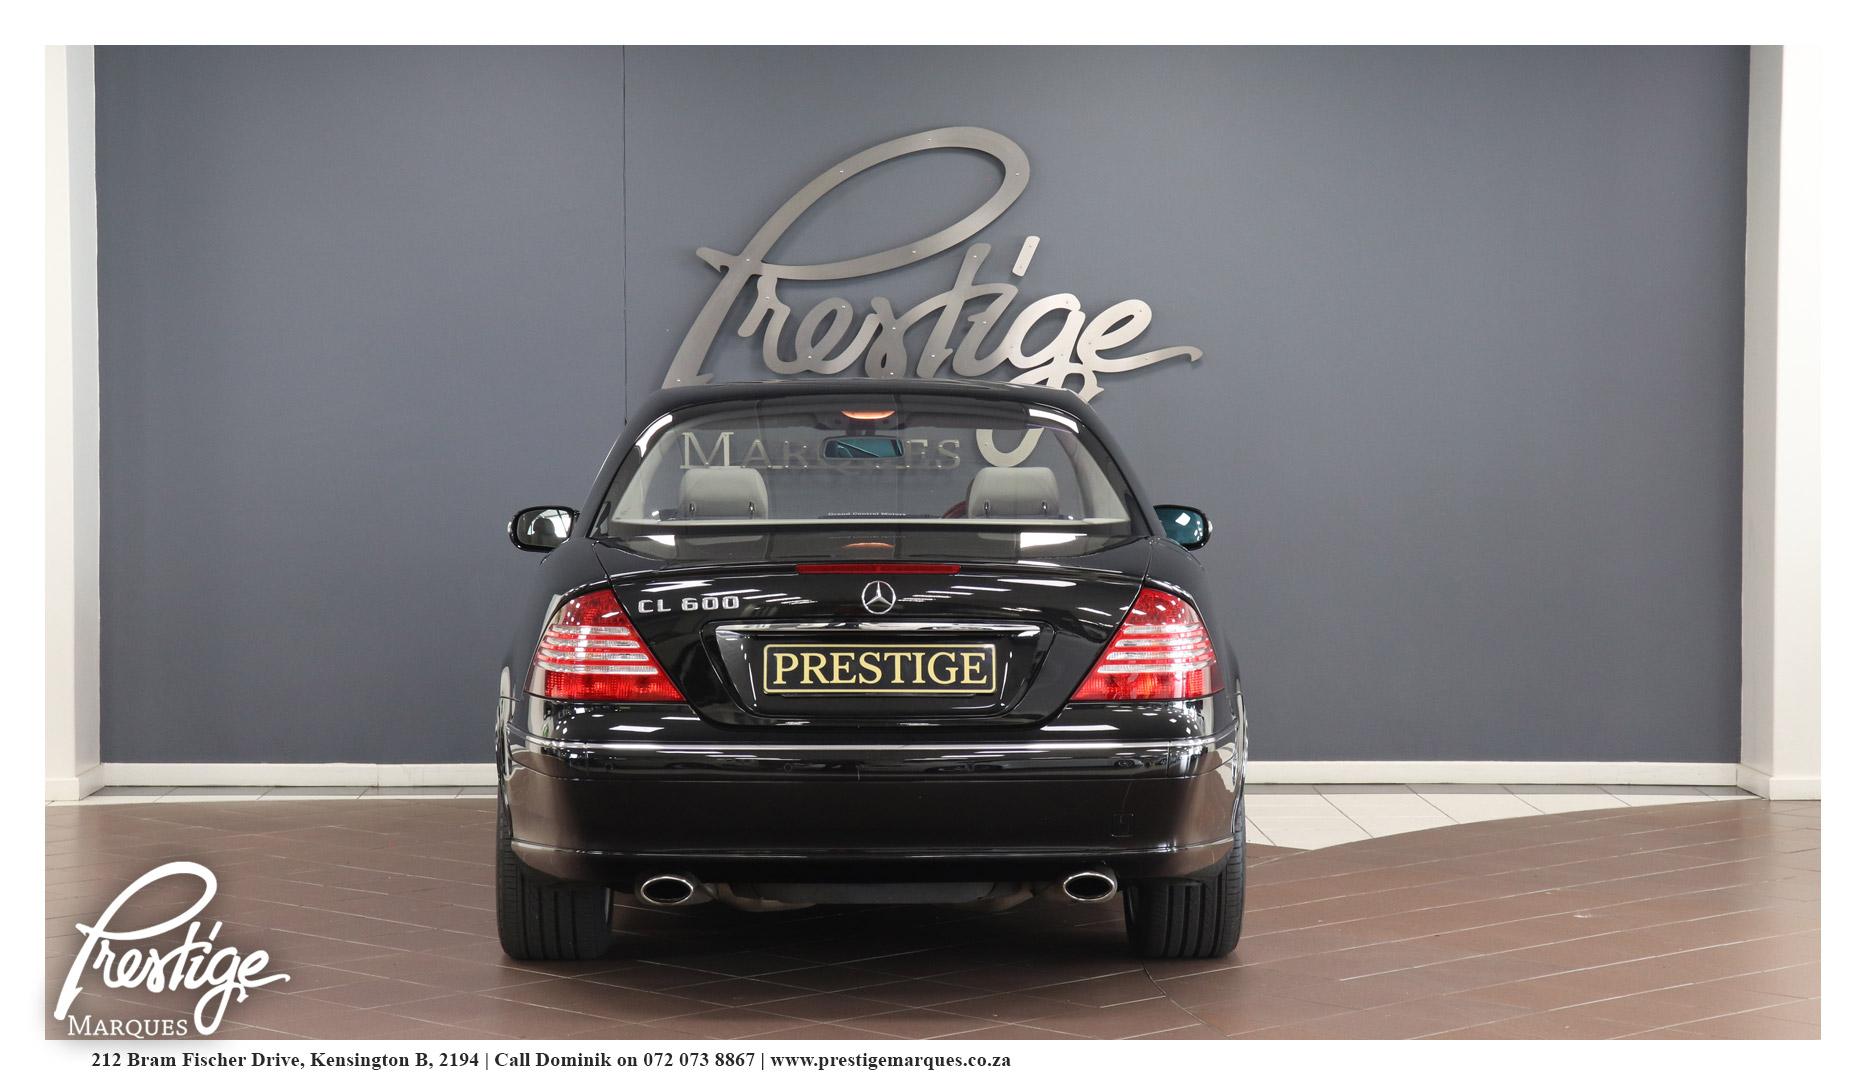 2005-Mercedes-Benz-CL-600-Coupe-Prestige-Marques-Randburg-Sandton-4